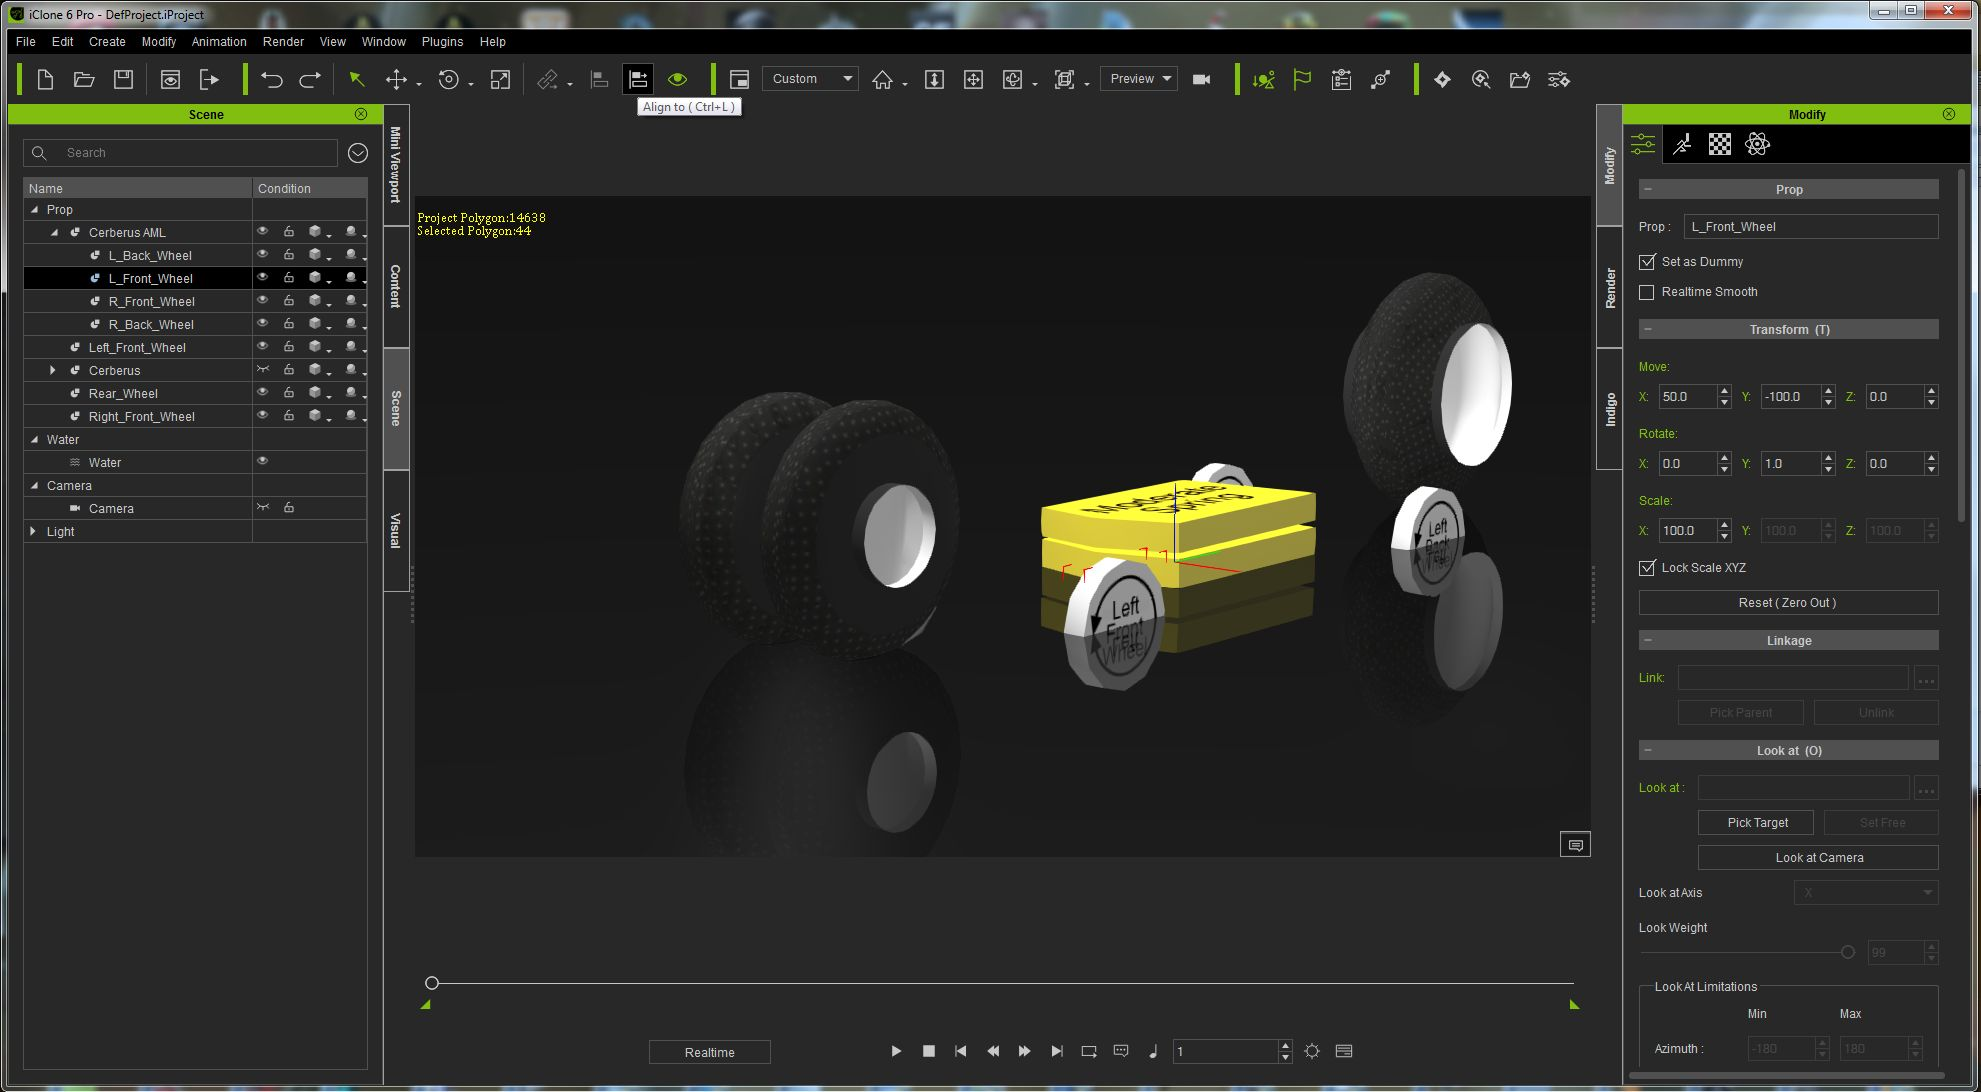 31_allign_wheel_and_dummy.jpg